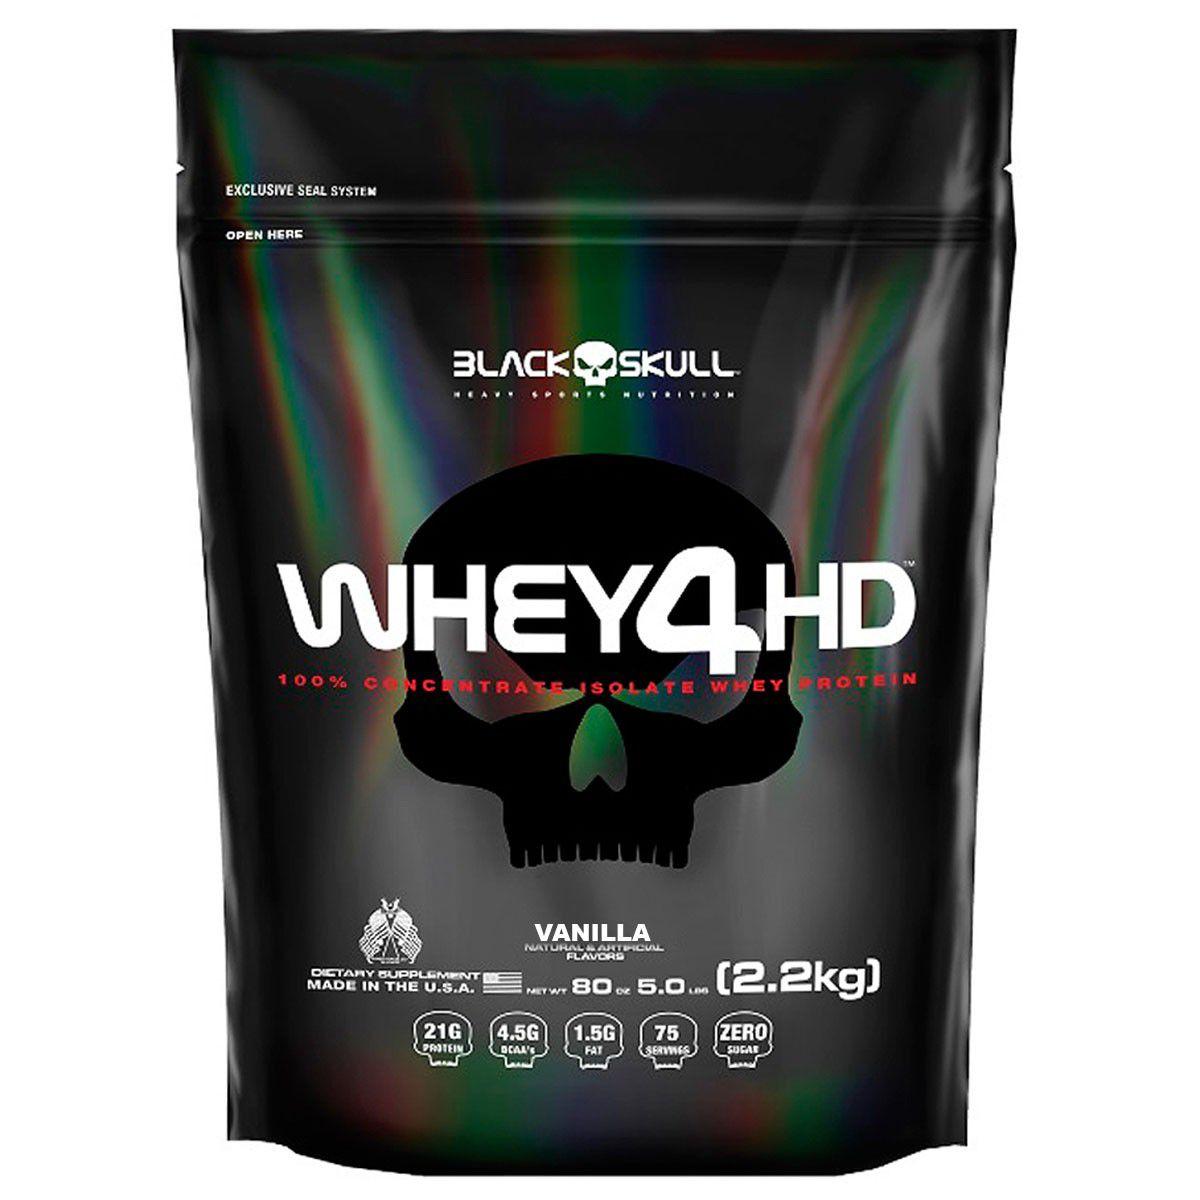 Whey 4HD Refil (2,2kg) - Black Skull